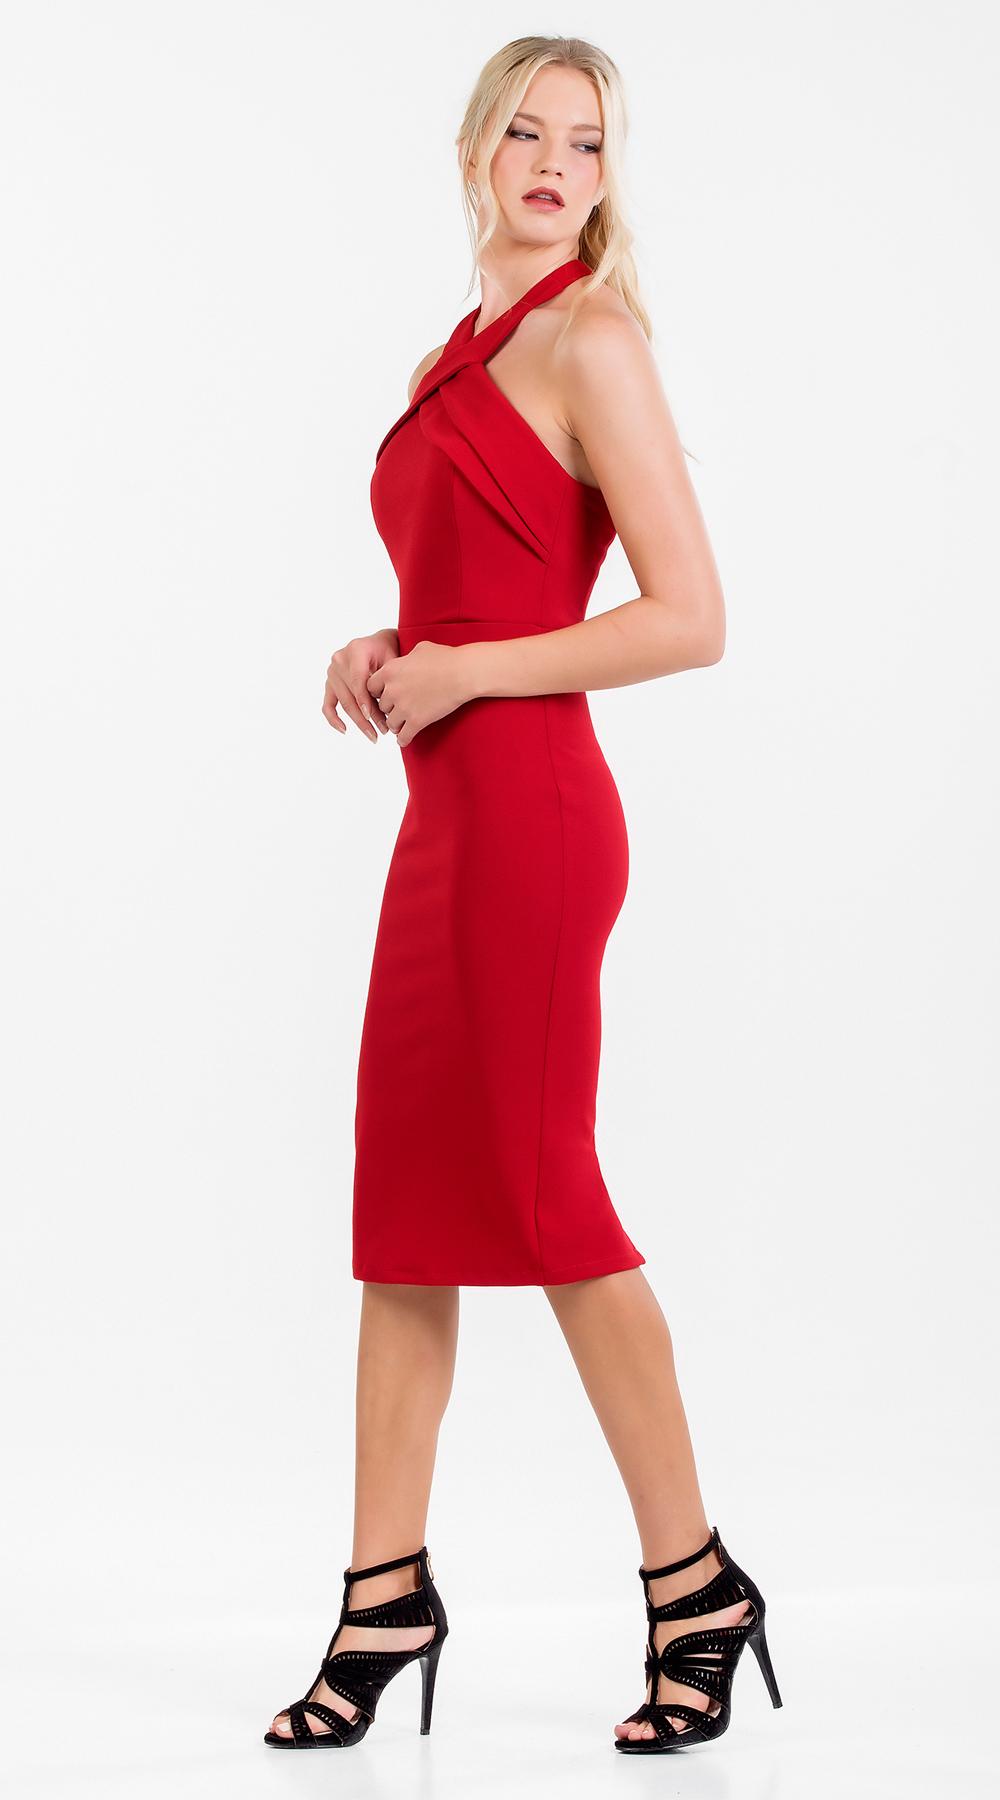 ec97be60b998 Μίντι bodycon εξώπλατο φόρεμα infinity Online - OEM - F17ON-5824030